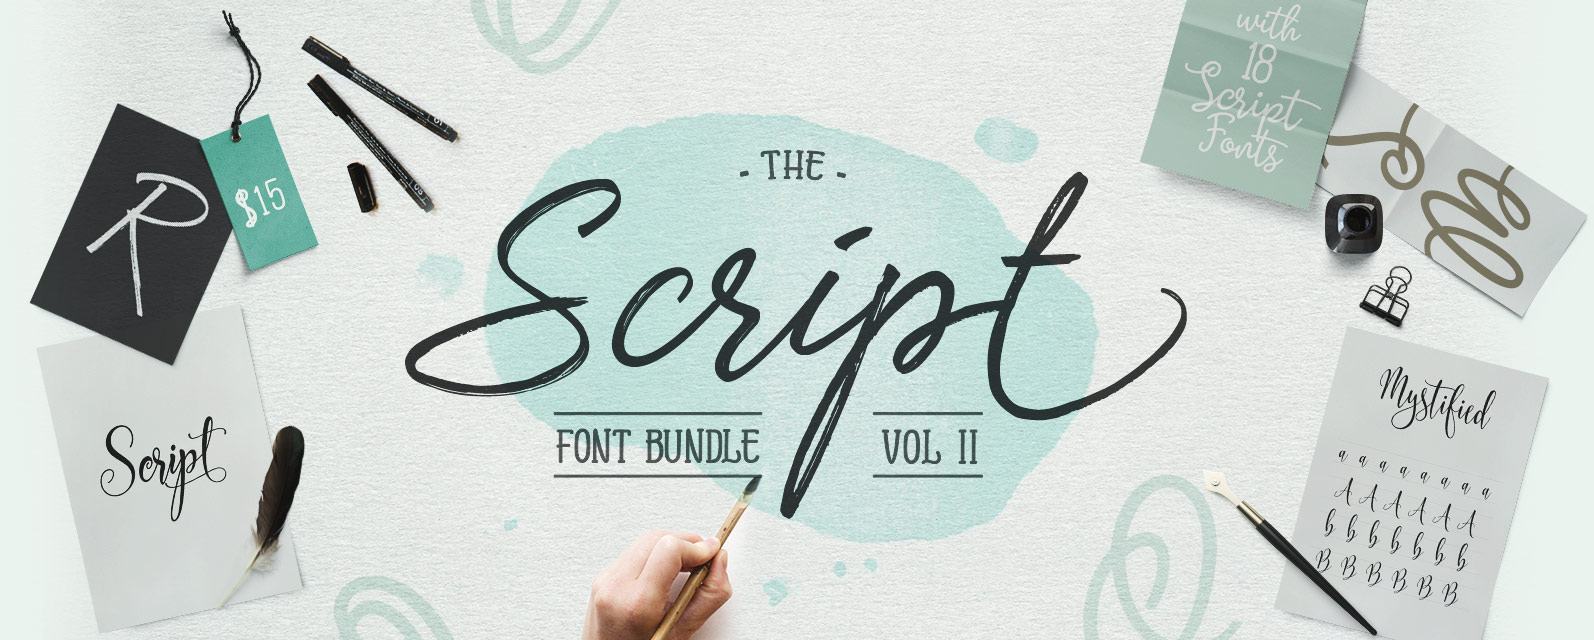 The Script Font Bundle Vol 2